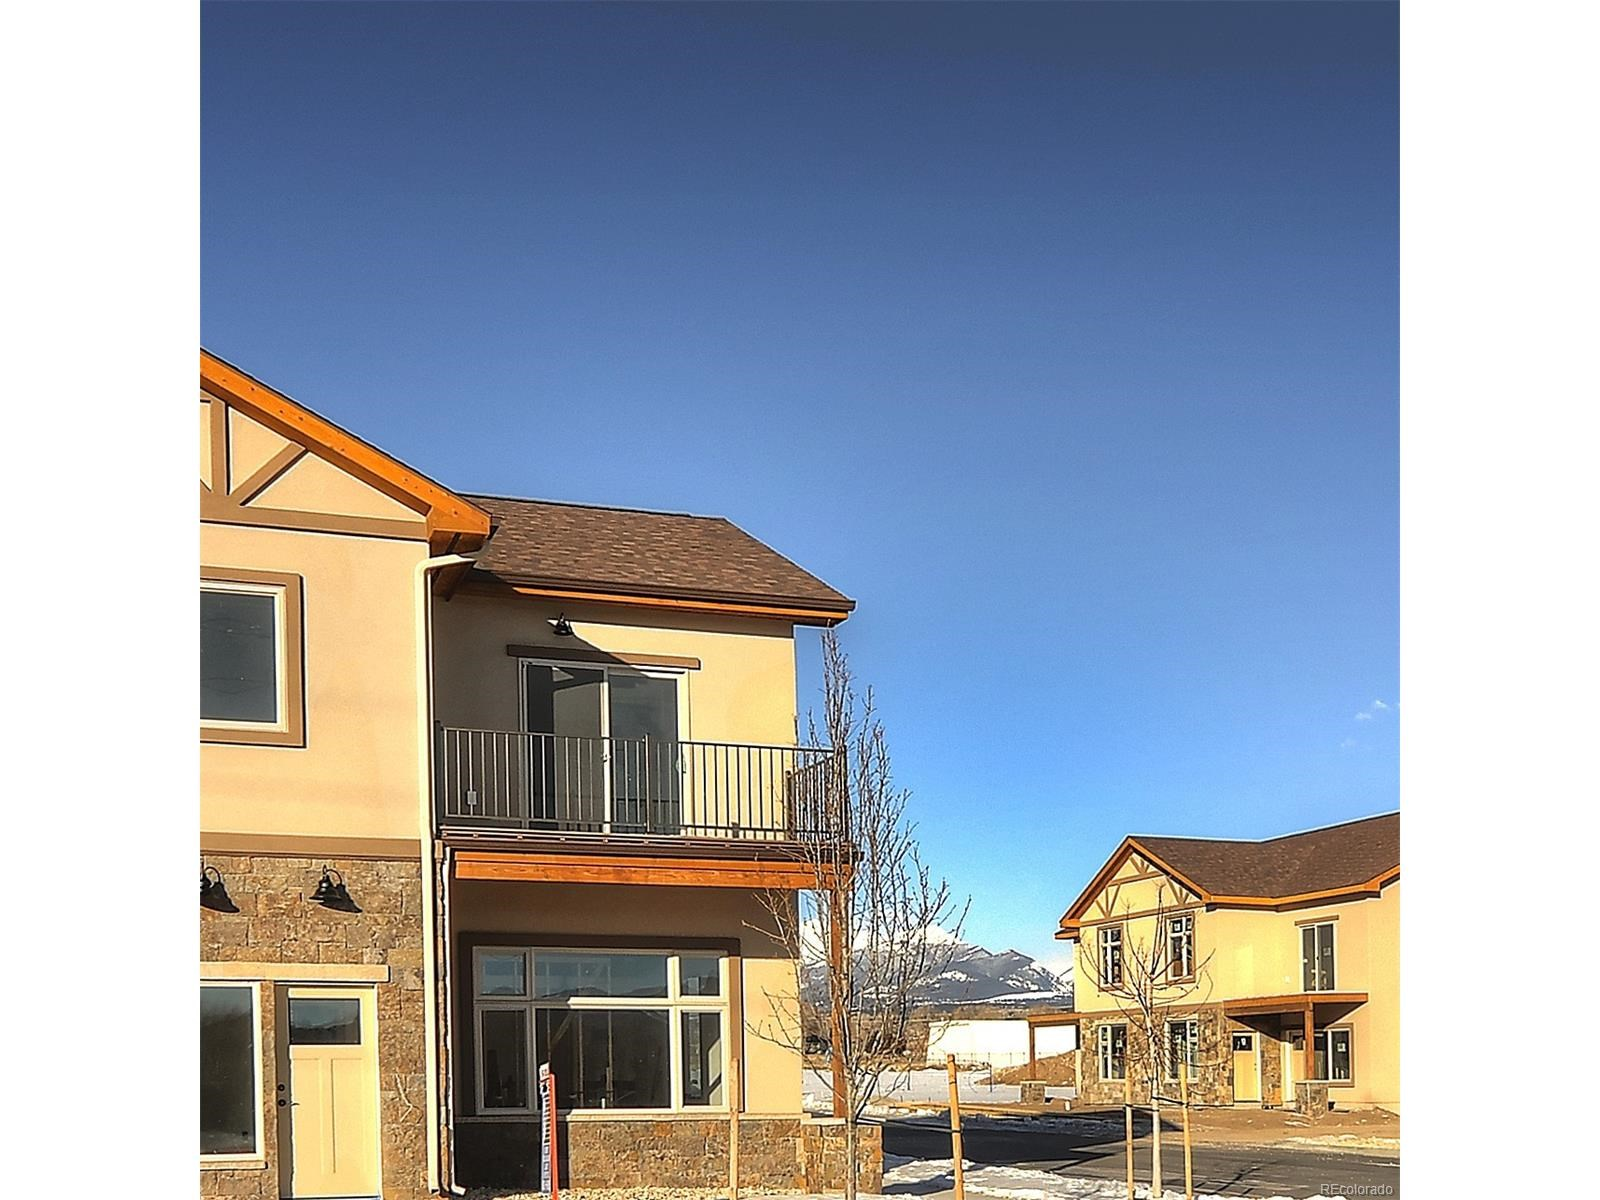 MLS# 2803726 - 1 - 219 Summitview Lane, Poncha Springs, CO 81242